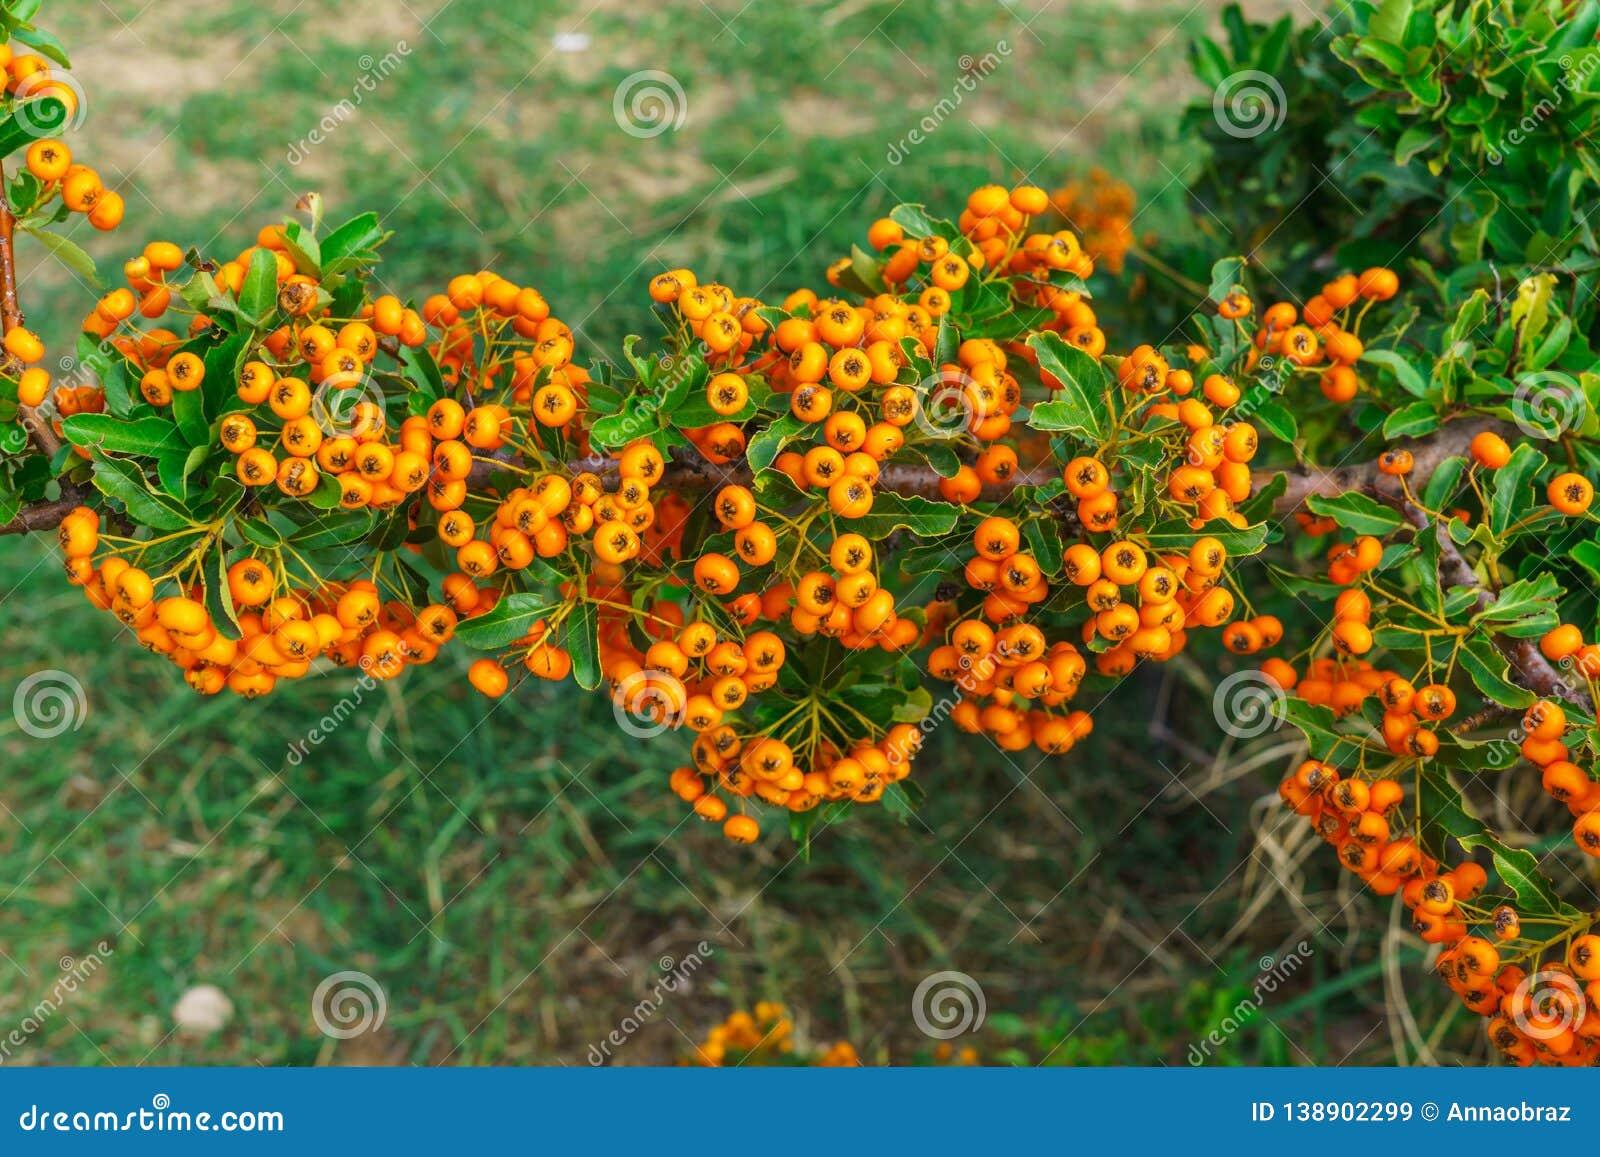 Decorative Bush With Orange Berries Pirakanta In The Park Stock